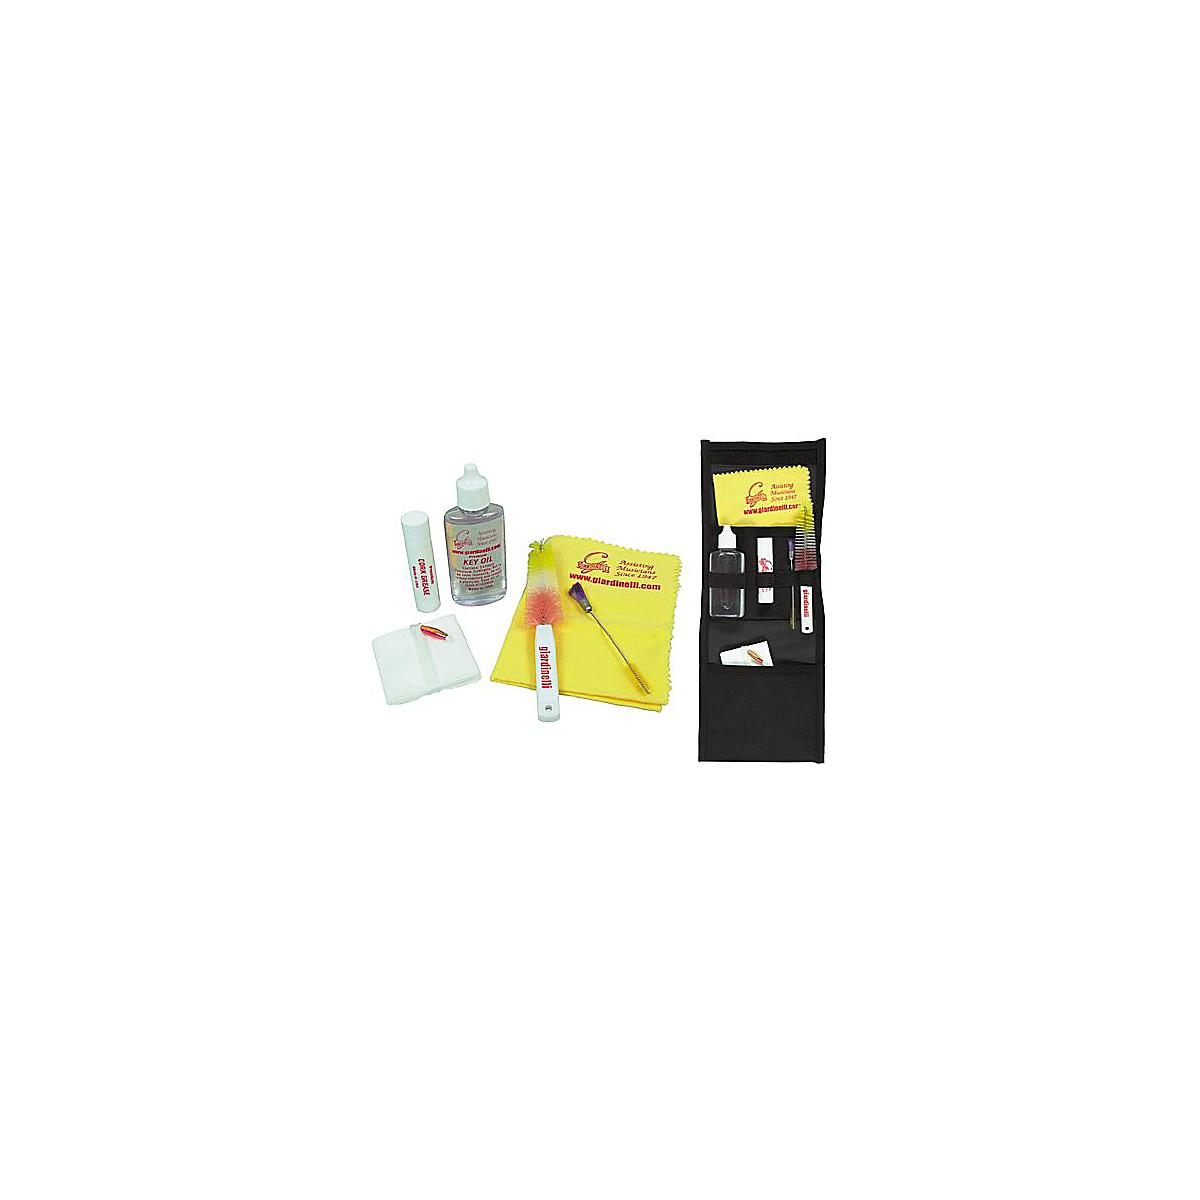 Giardinelli Composite Clarinet Master Care Pack